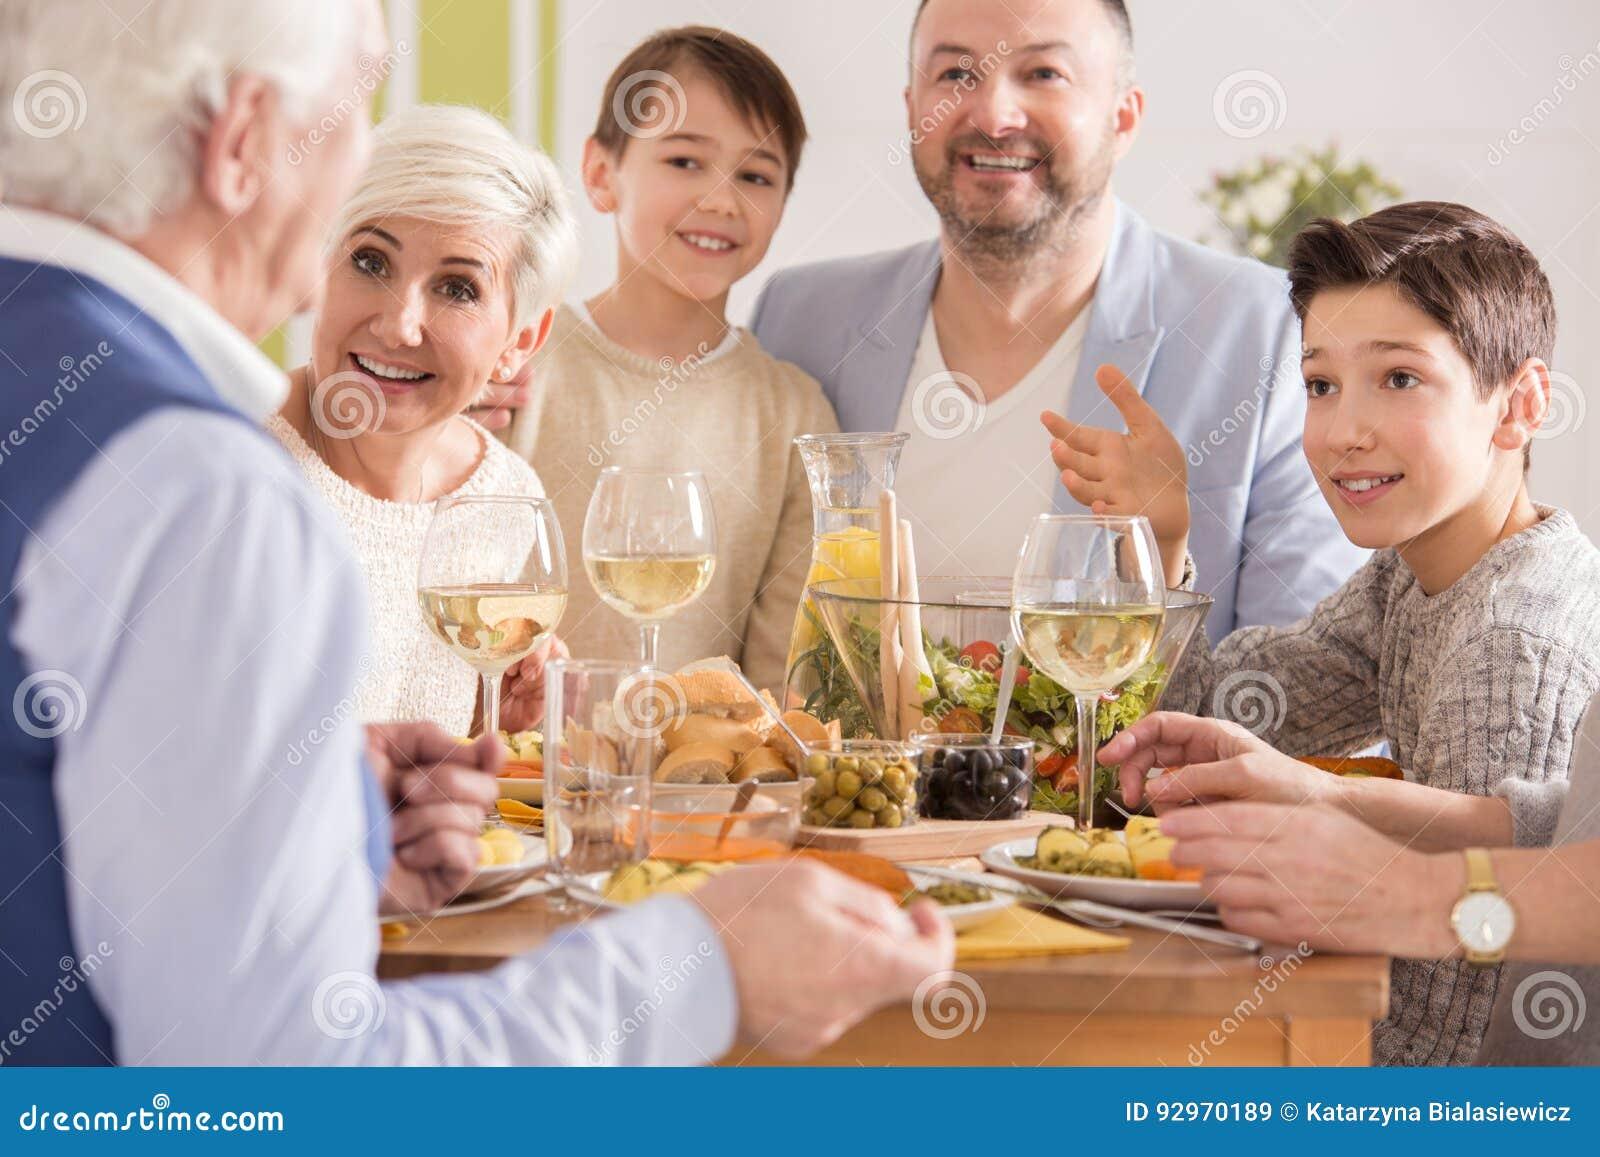 Grand-papa racontant une histoire